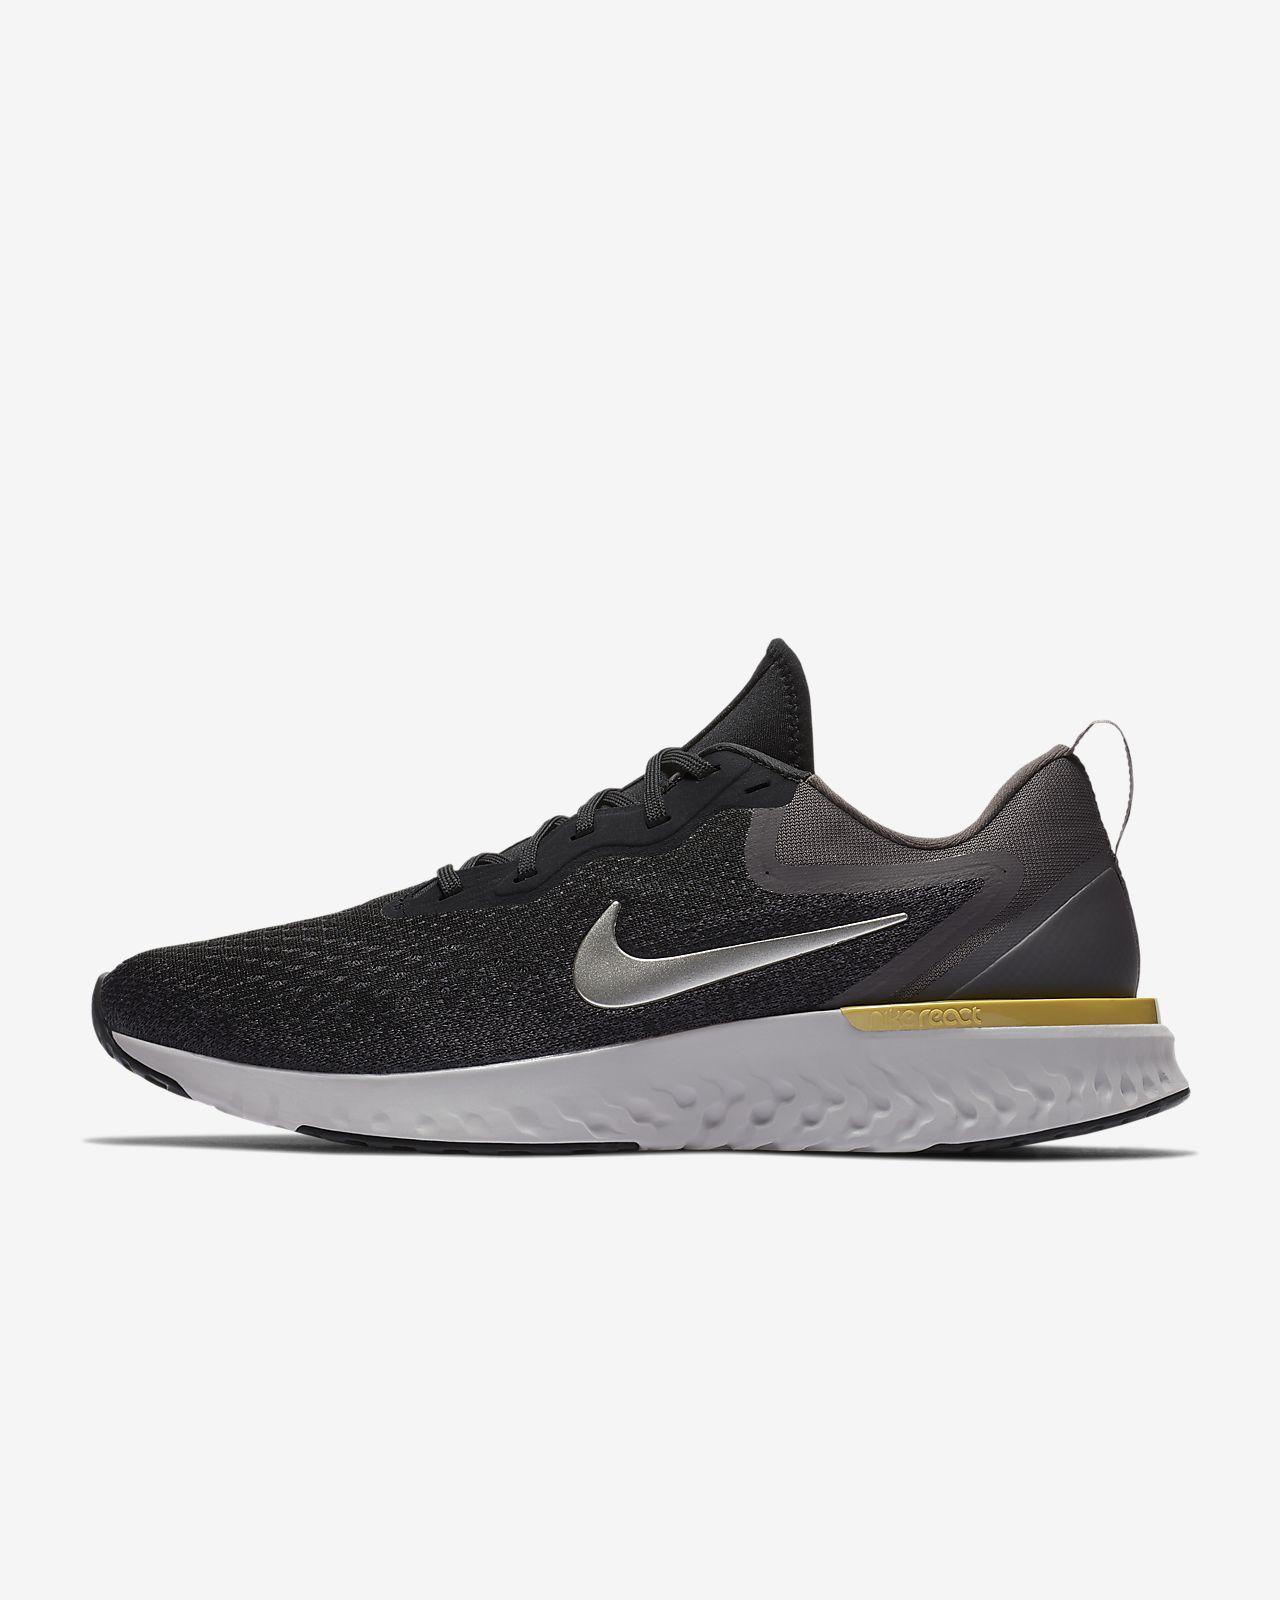 reputable site c685a c4676 ... Nike Odyssey React Men s Running Shoe